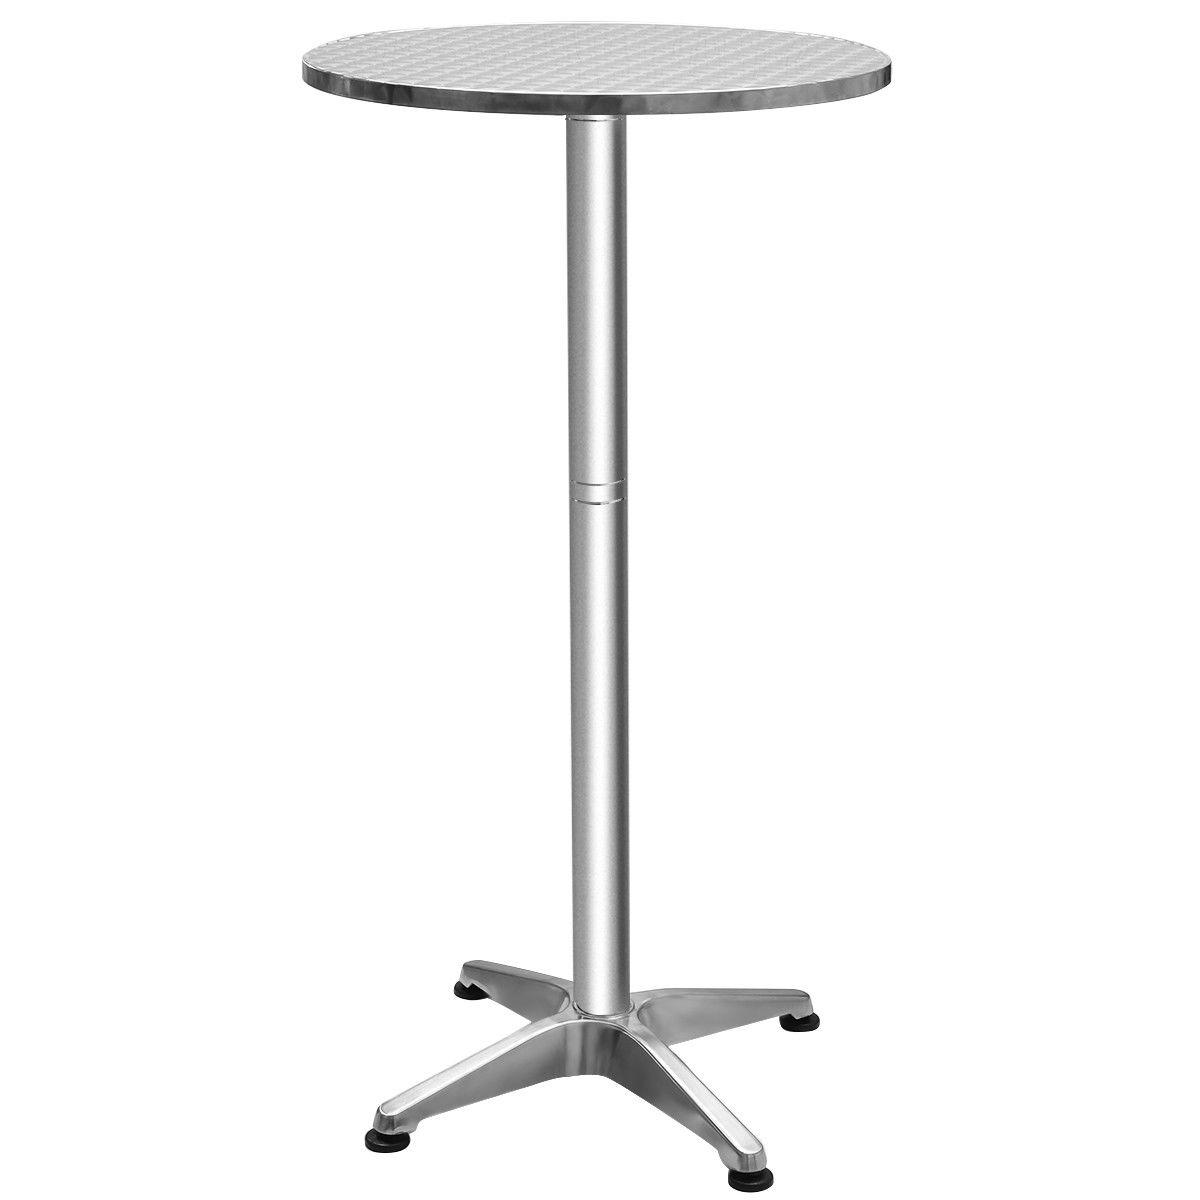 Stainless Steel Aluminium Round Folding Desktop Bar Table HW56168